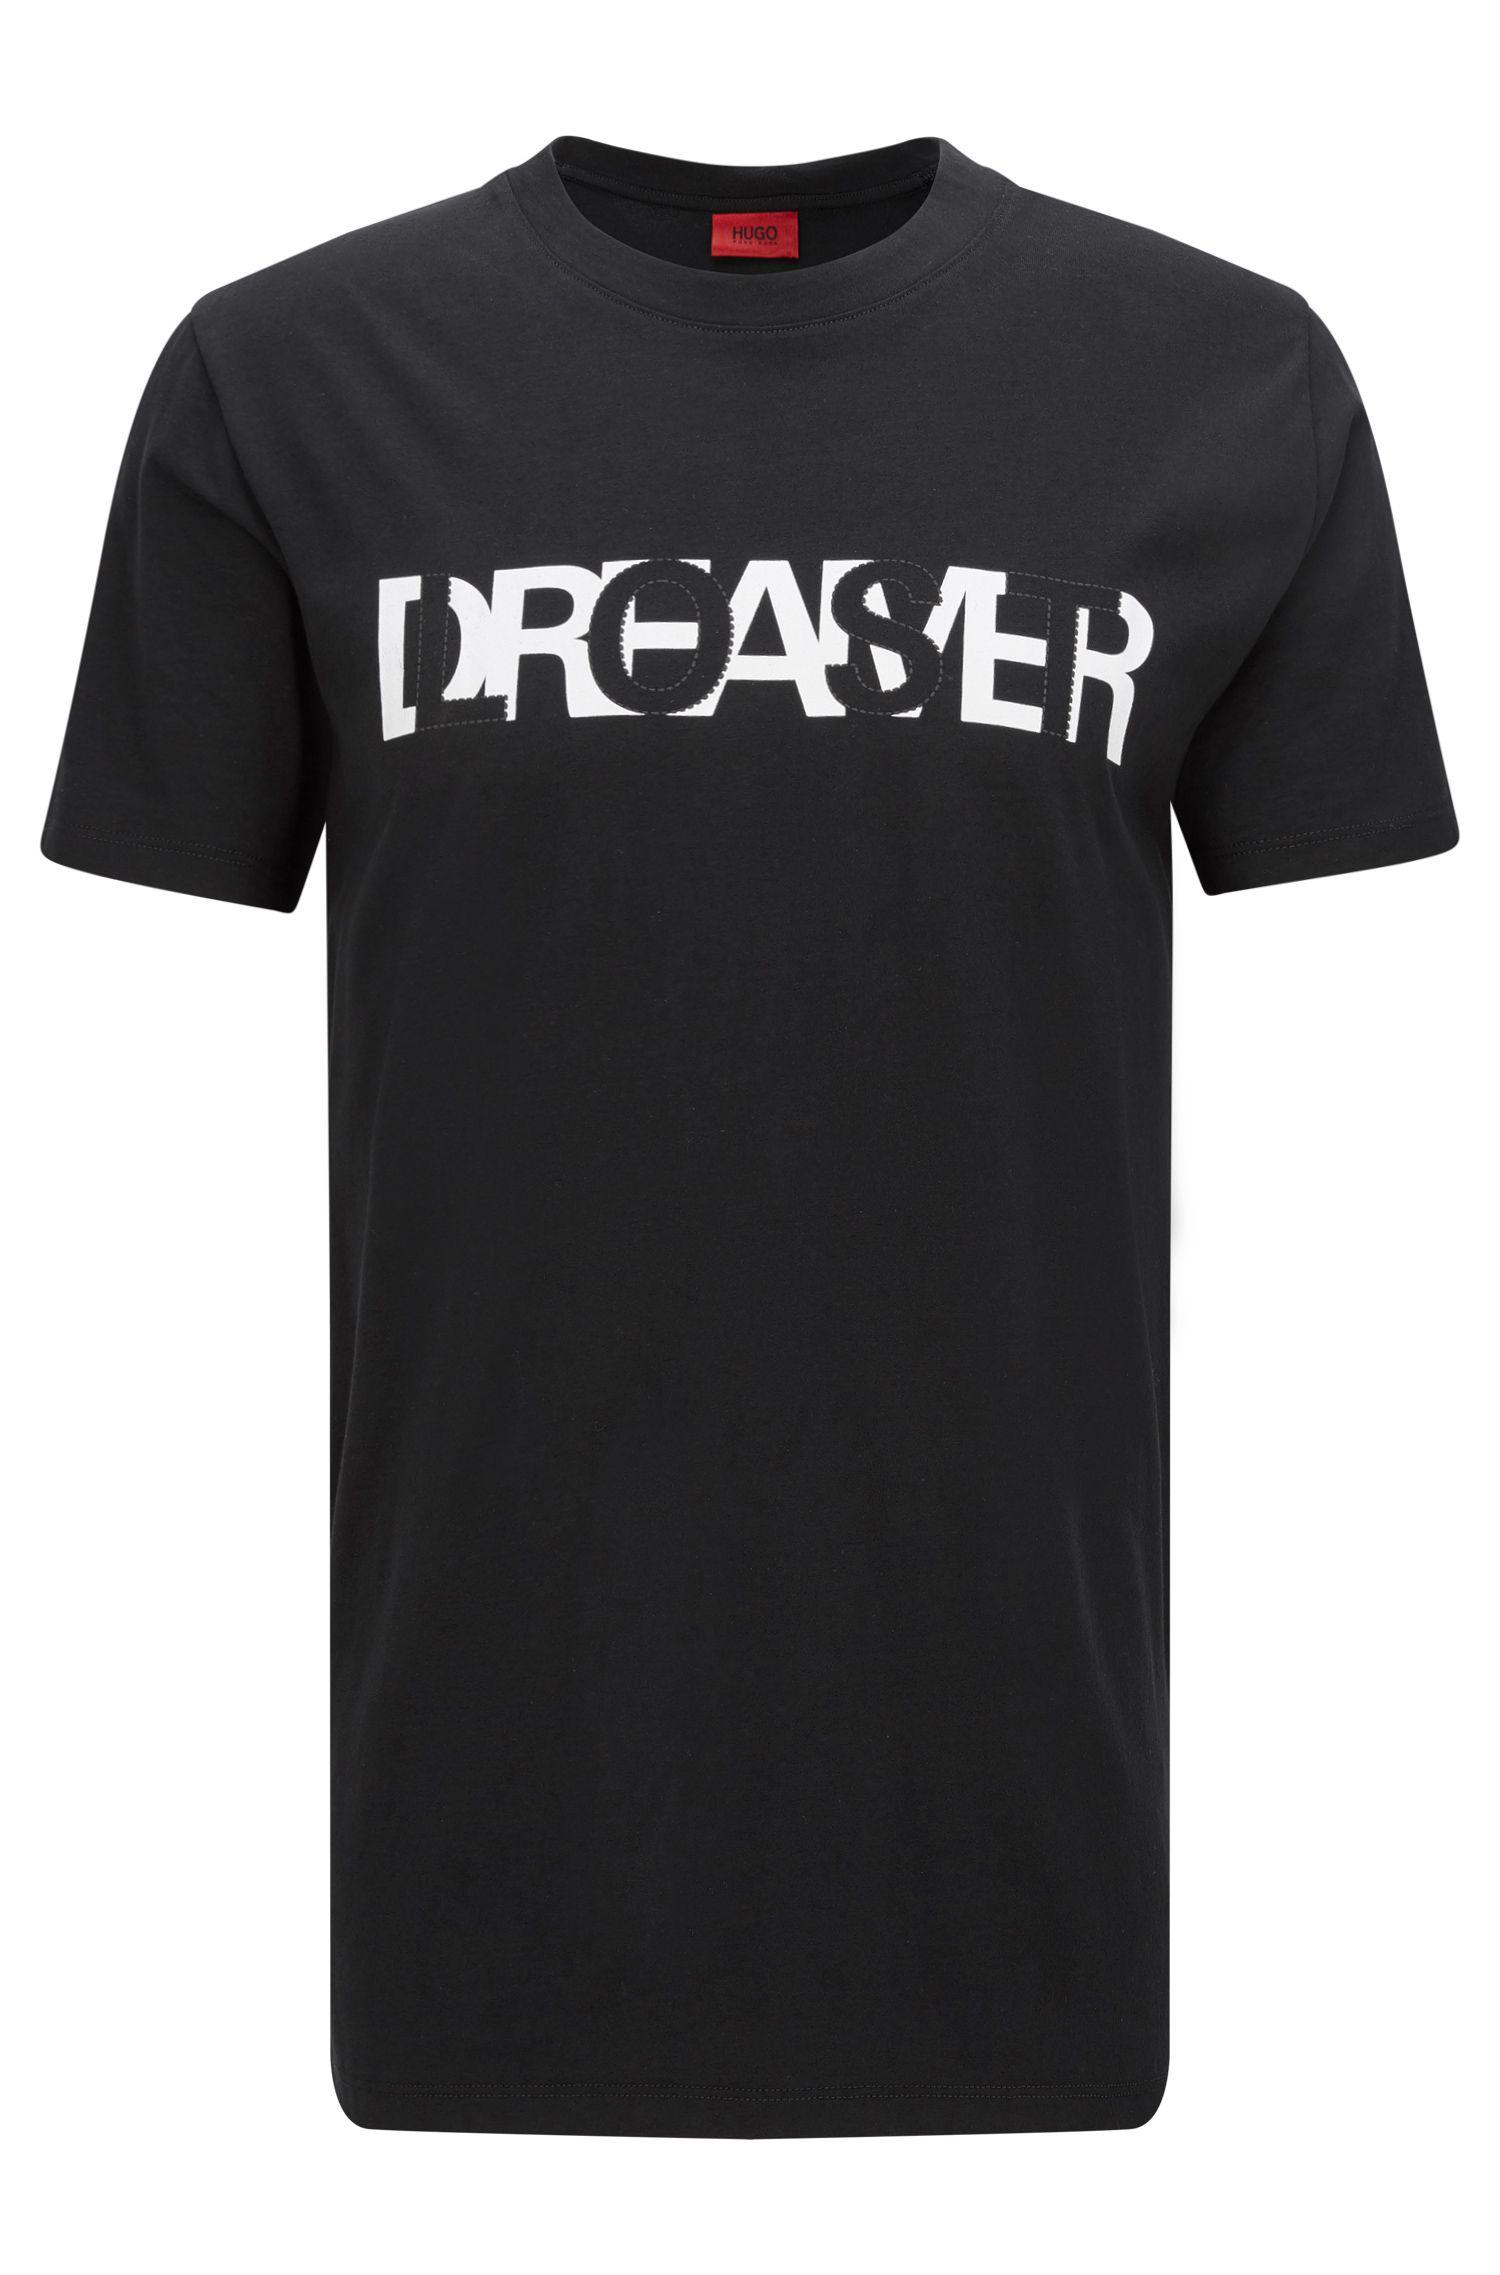 Cotton Graphic T-Shirt | Dreamer